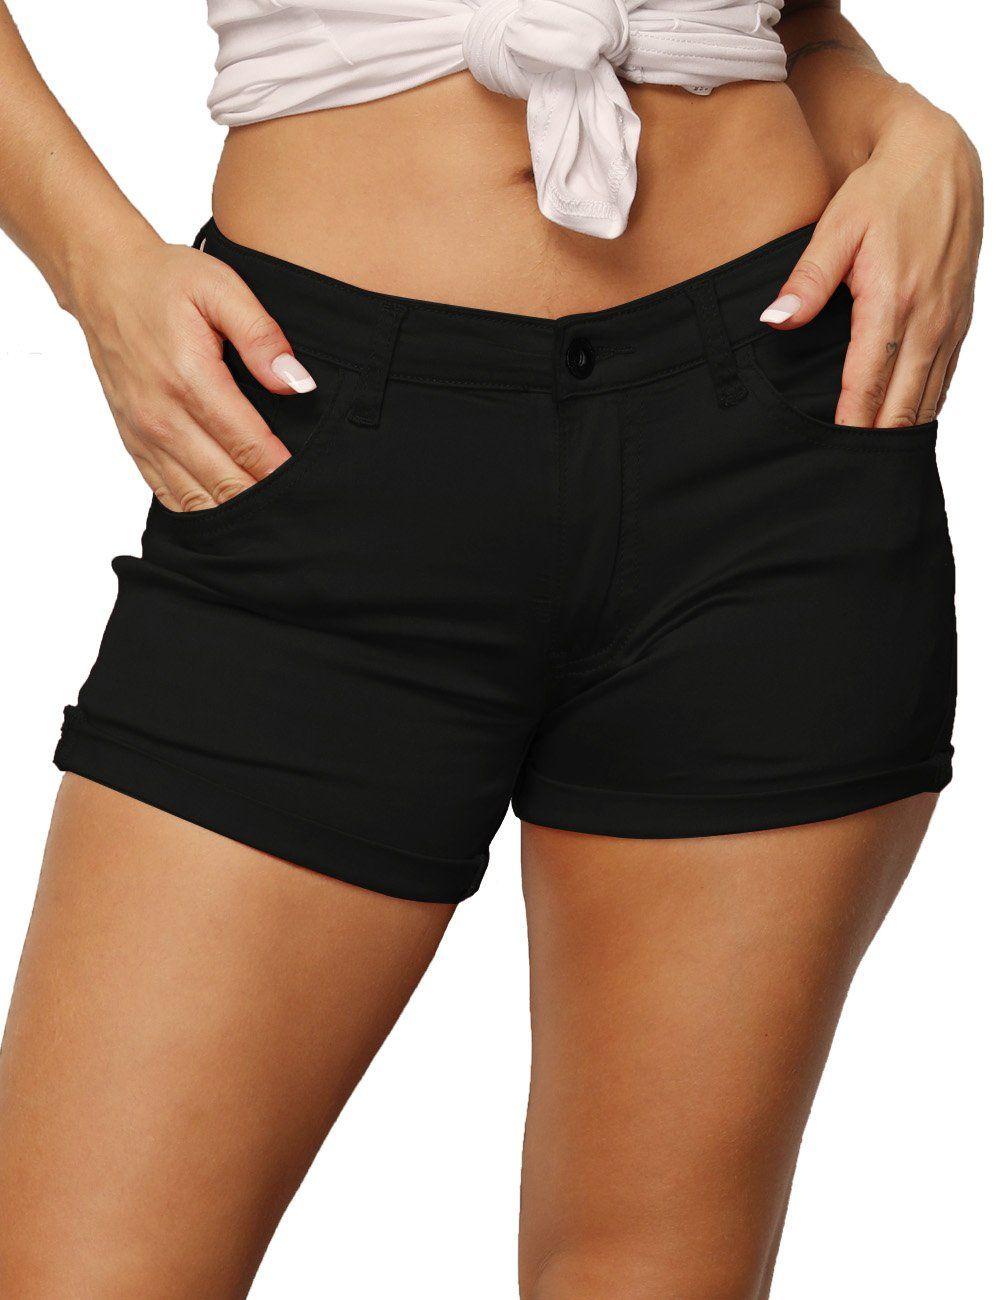 168d6cbb2f Haola Womens Casual Stretchy Shorts Juniors Summer MidRise Shorts ...